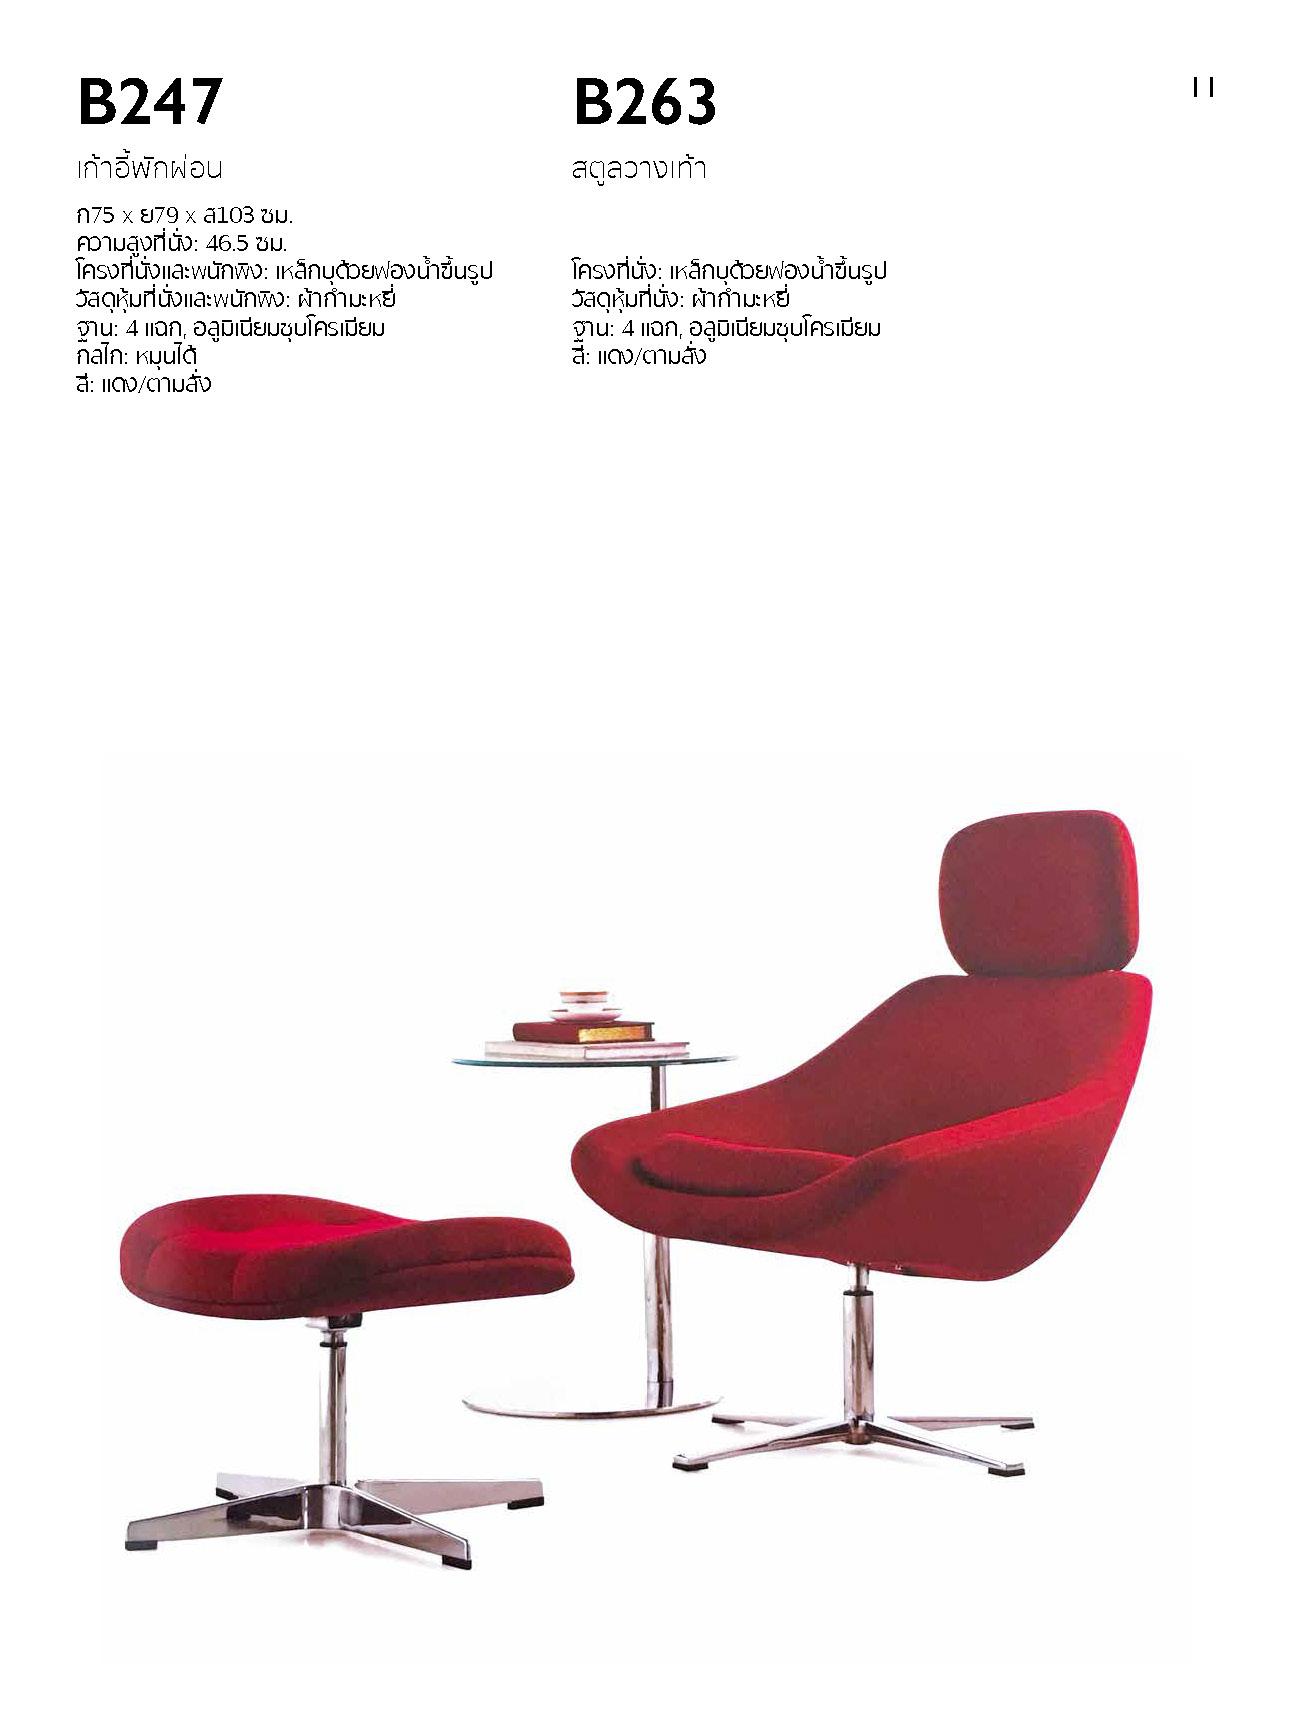 Top Furniture Catalog 2019_Page_46.jpg